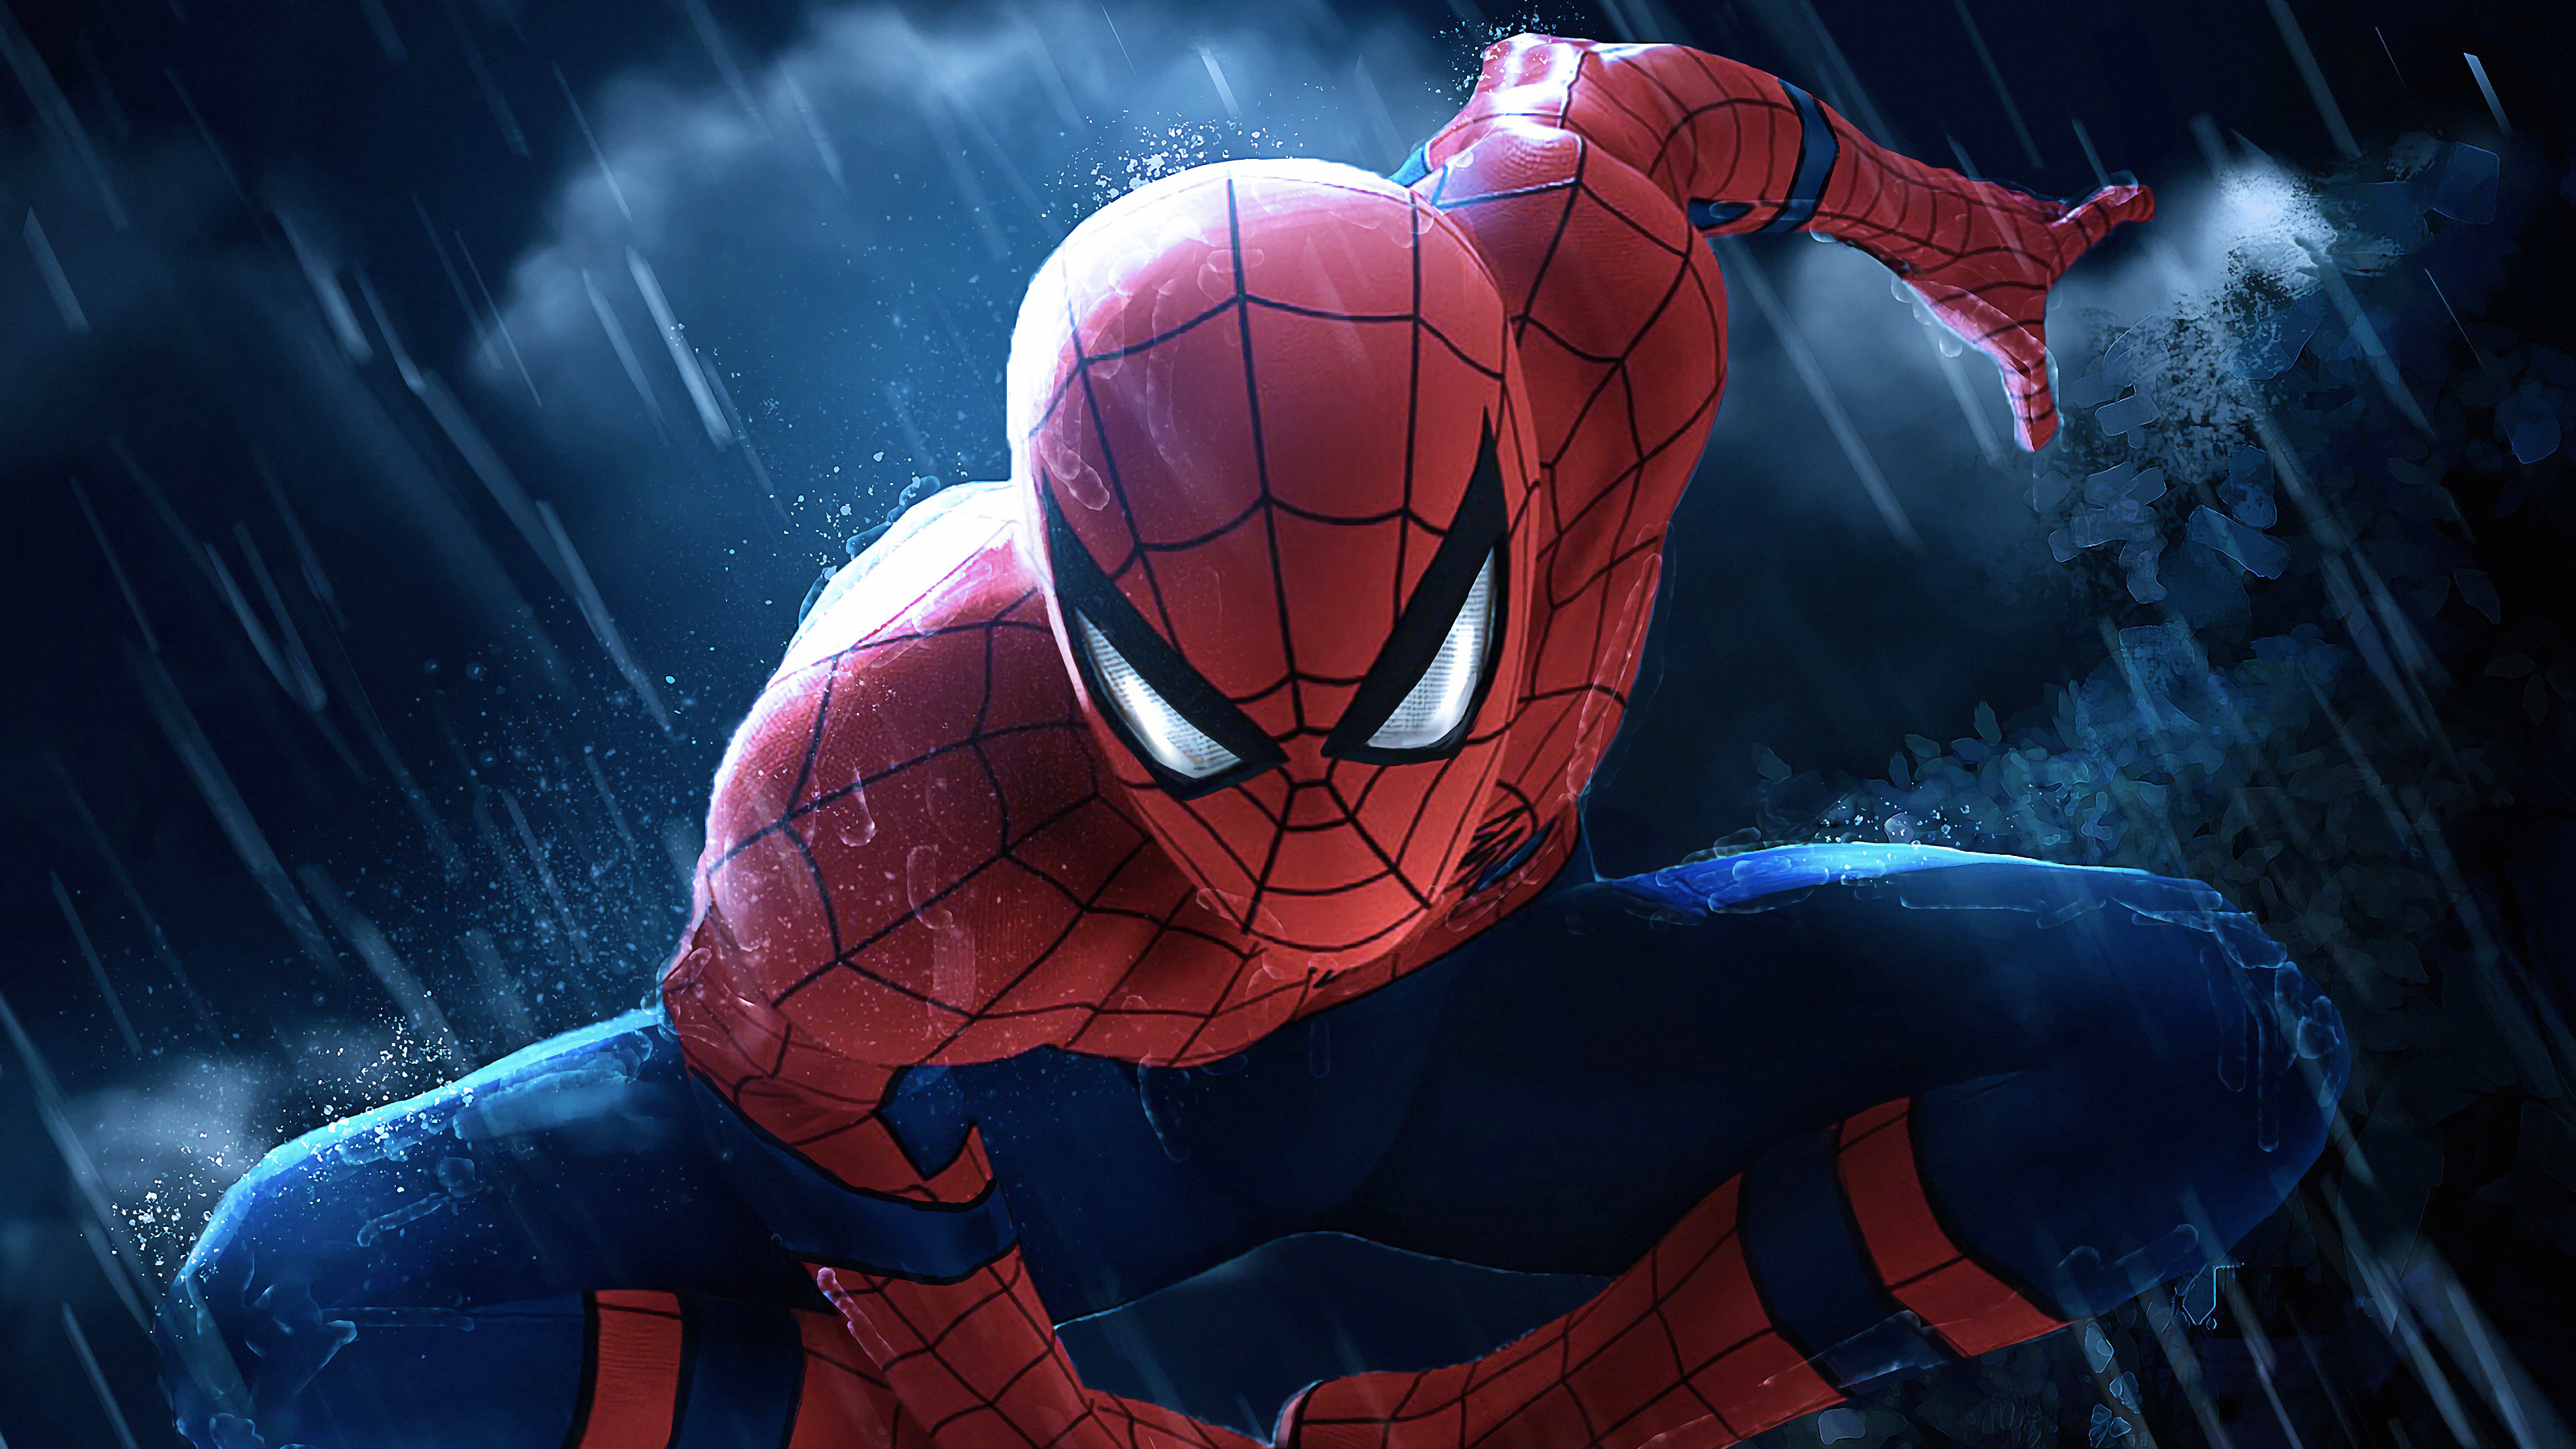 spiderman ps 1568054995 - Spiderman Ps - superheroes wallpapers, spiderman wallpapers, hd-wallpapers, digital art wallpapers, artwork wallpapers, artstation wallpapers, art wallpapers, 4k-wallpapers